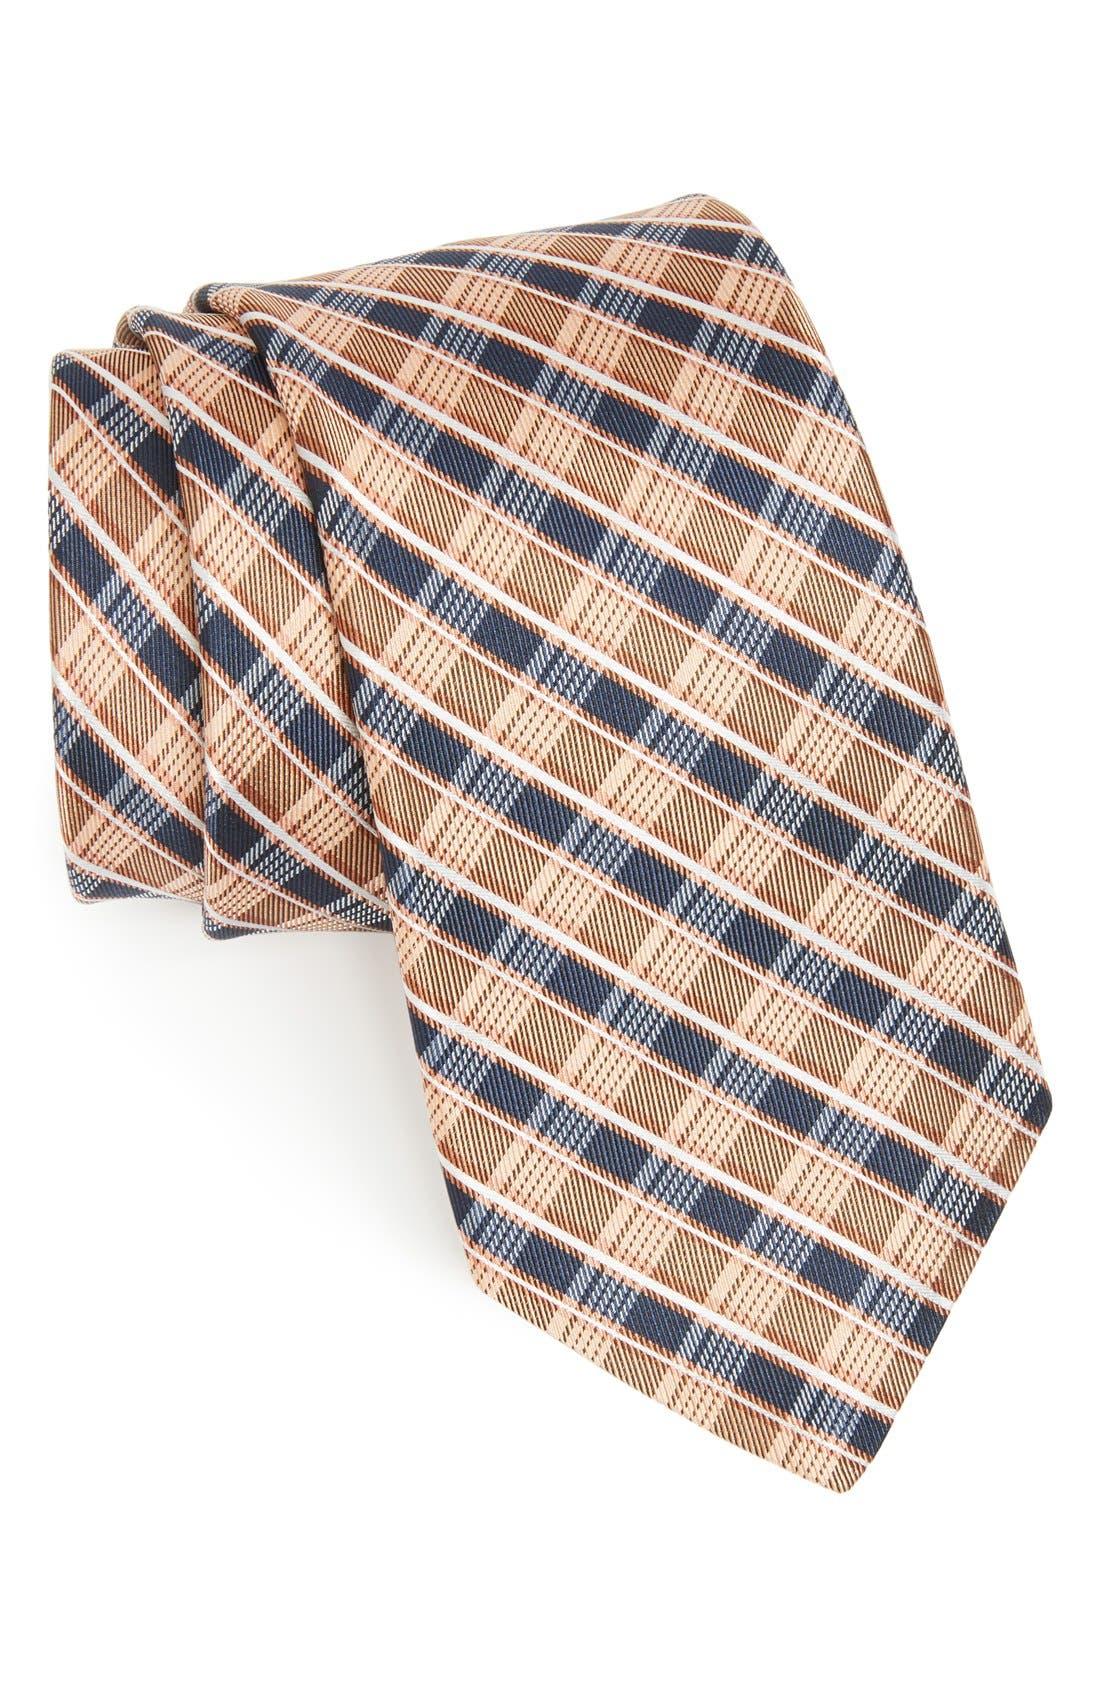 Main Image - Michael Kors Plaid Woven Silk Tie